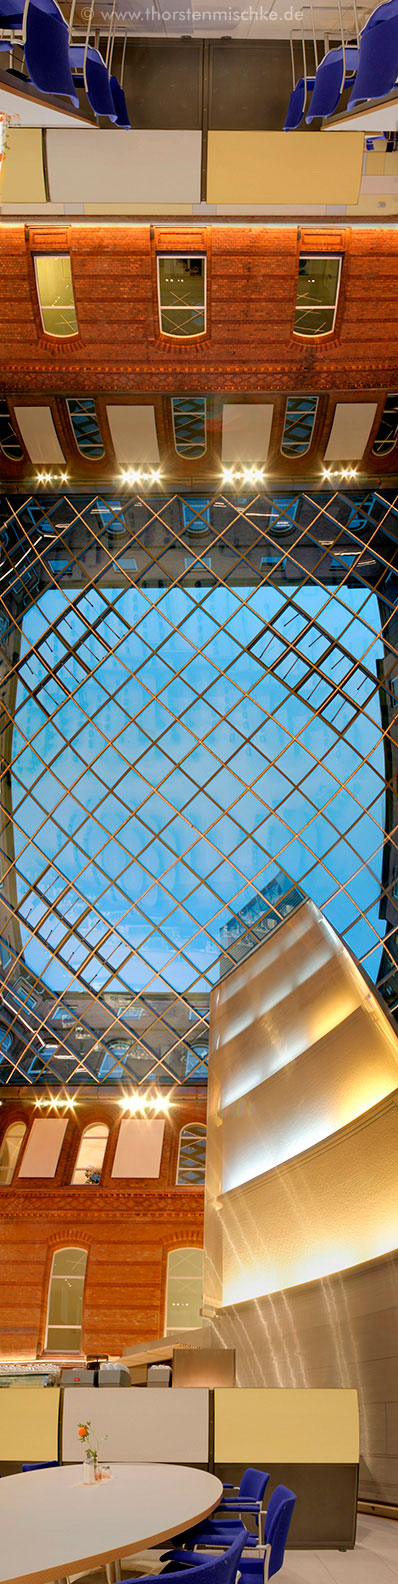 Foto: Landeshaus Kiel-Nordhof Nord-Süd-Achse © www.ThorstenMischke.de Fotodesign Kiel